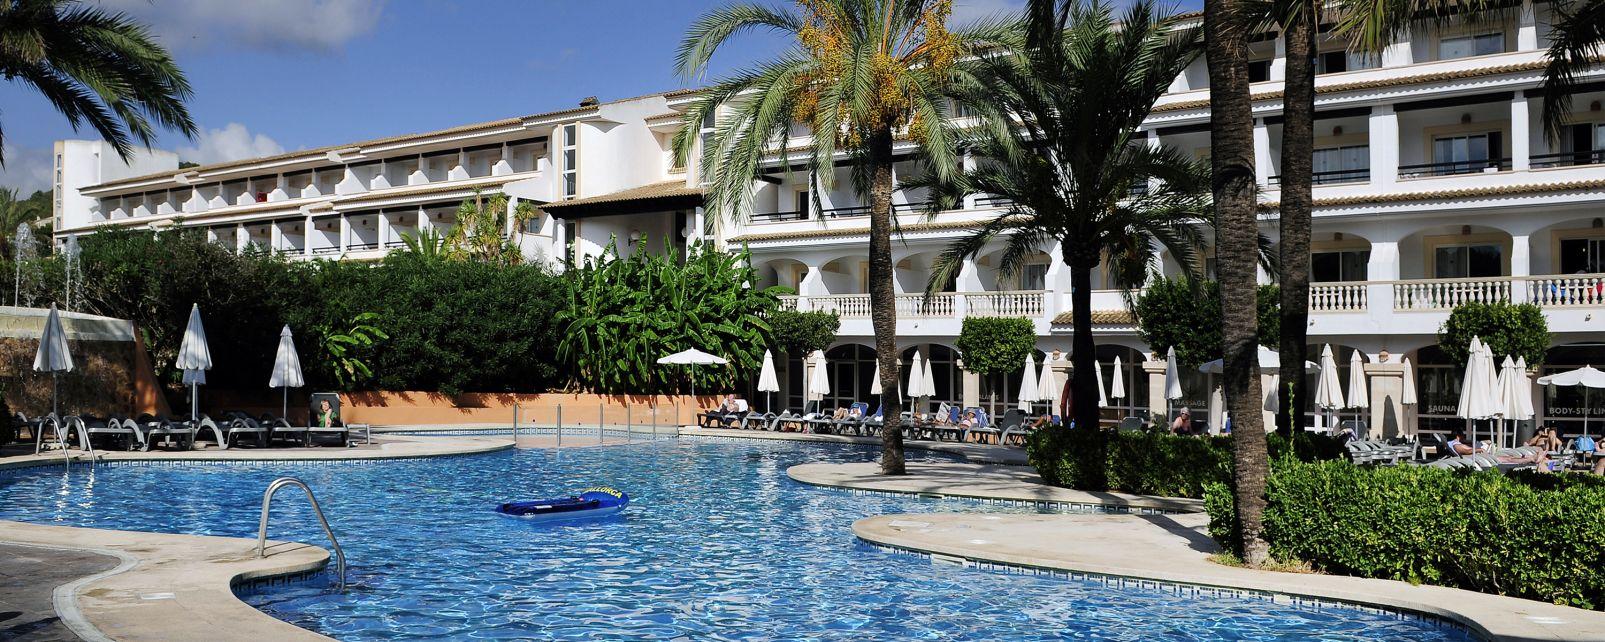 Naya Club Beach Club Font De Sa Cala